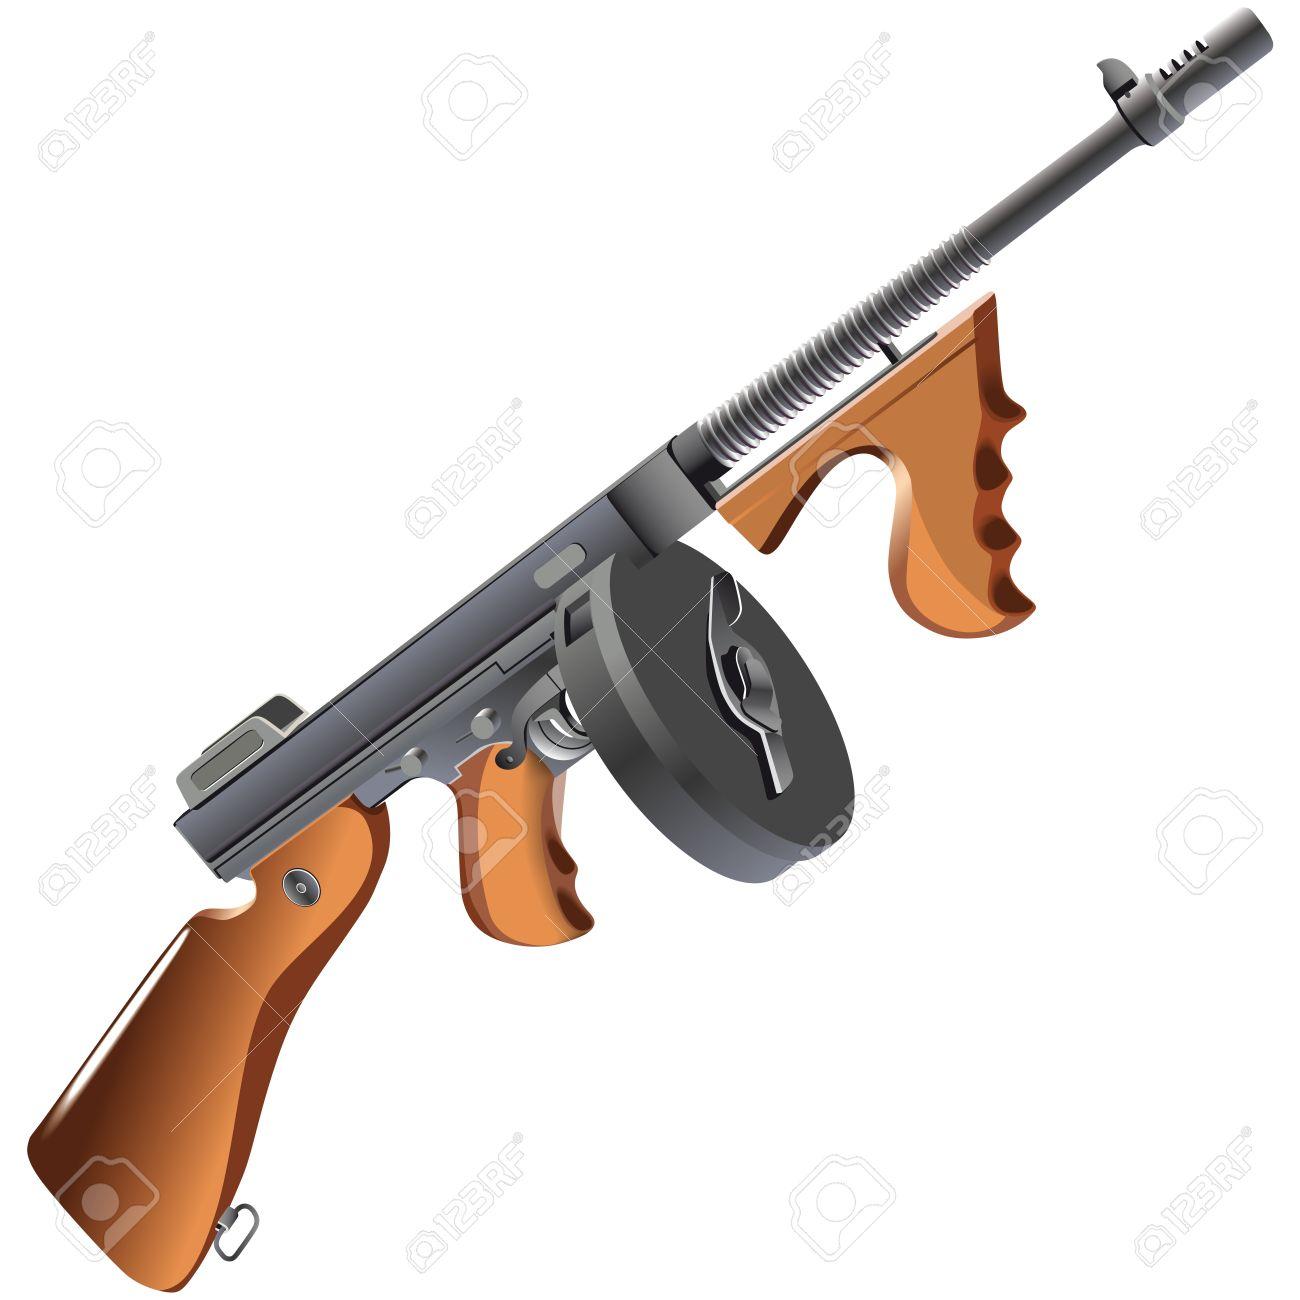 Mafia Weapons Gun Weapon of Mafia